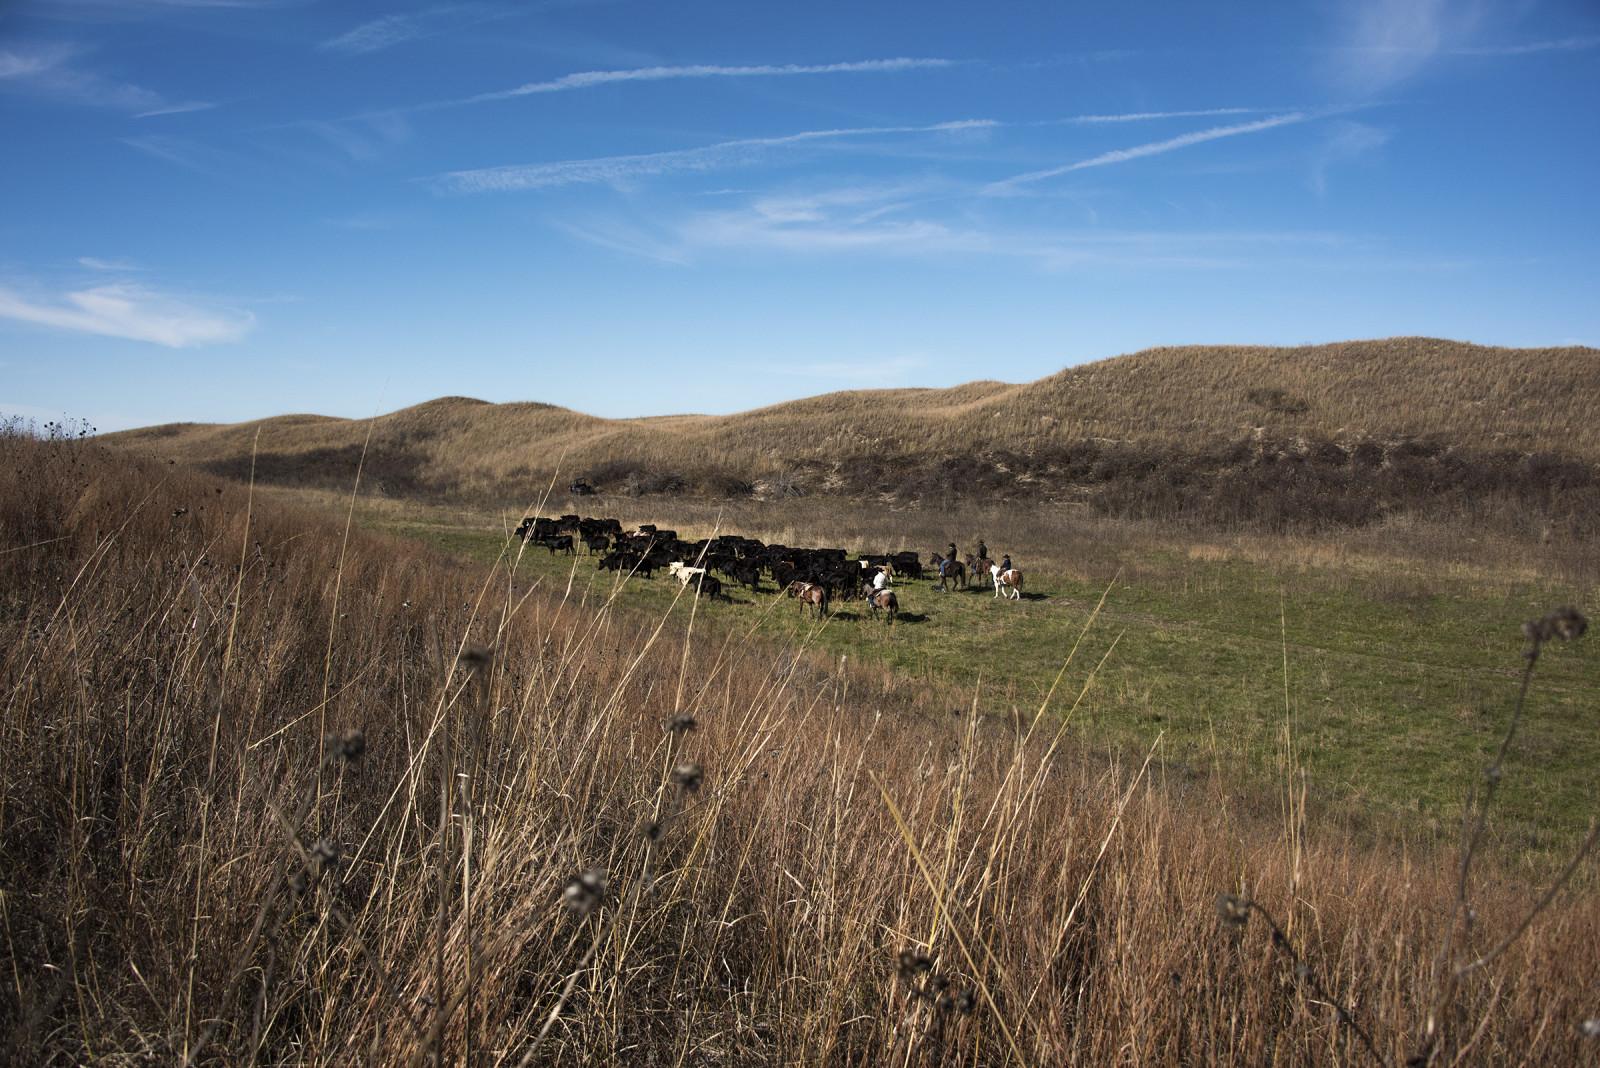 The Switzer family moving cattle through the Sandhills. (Mariah Lundgren)